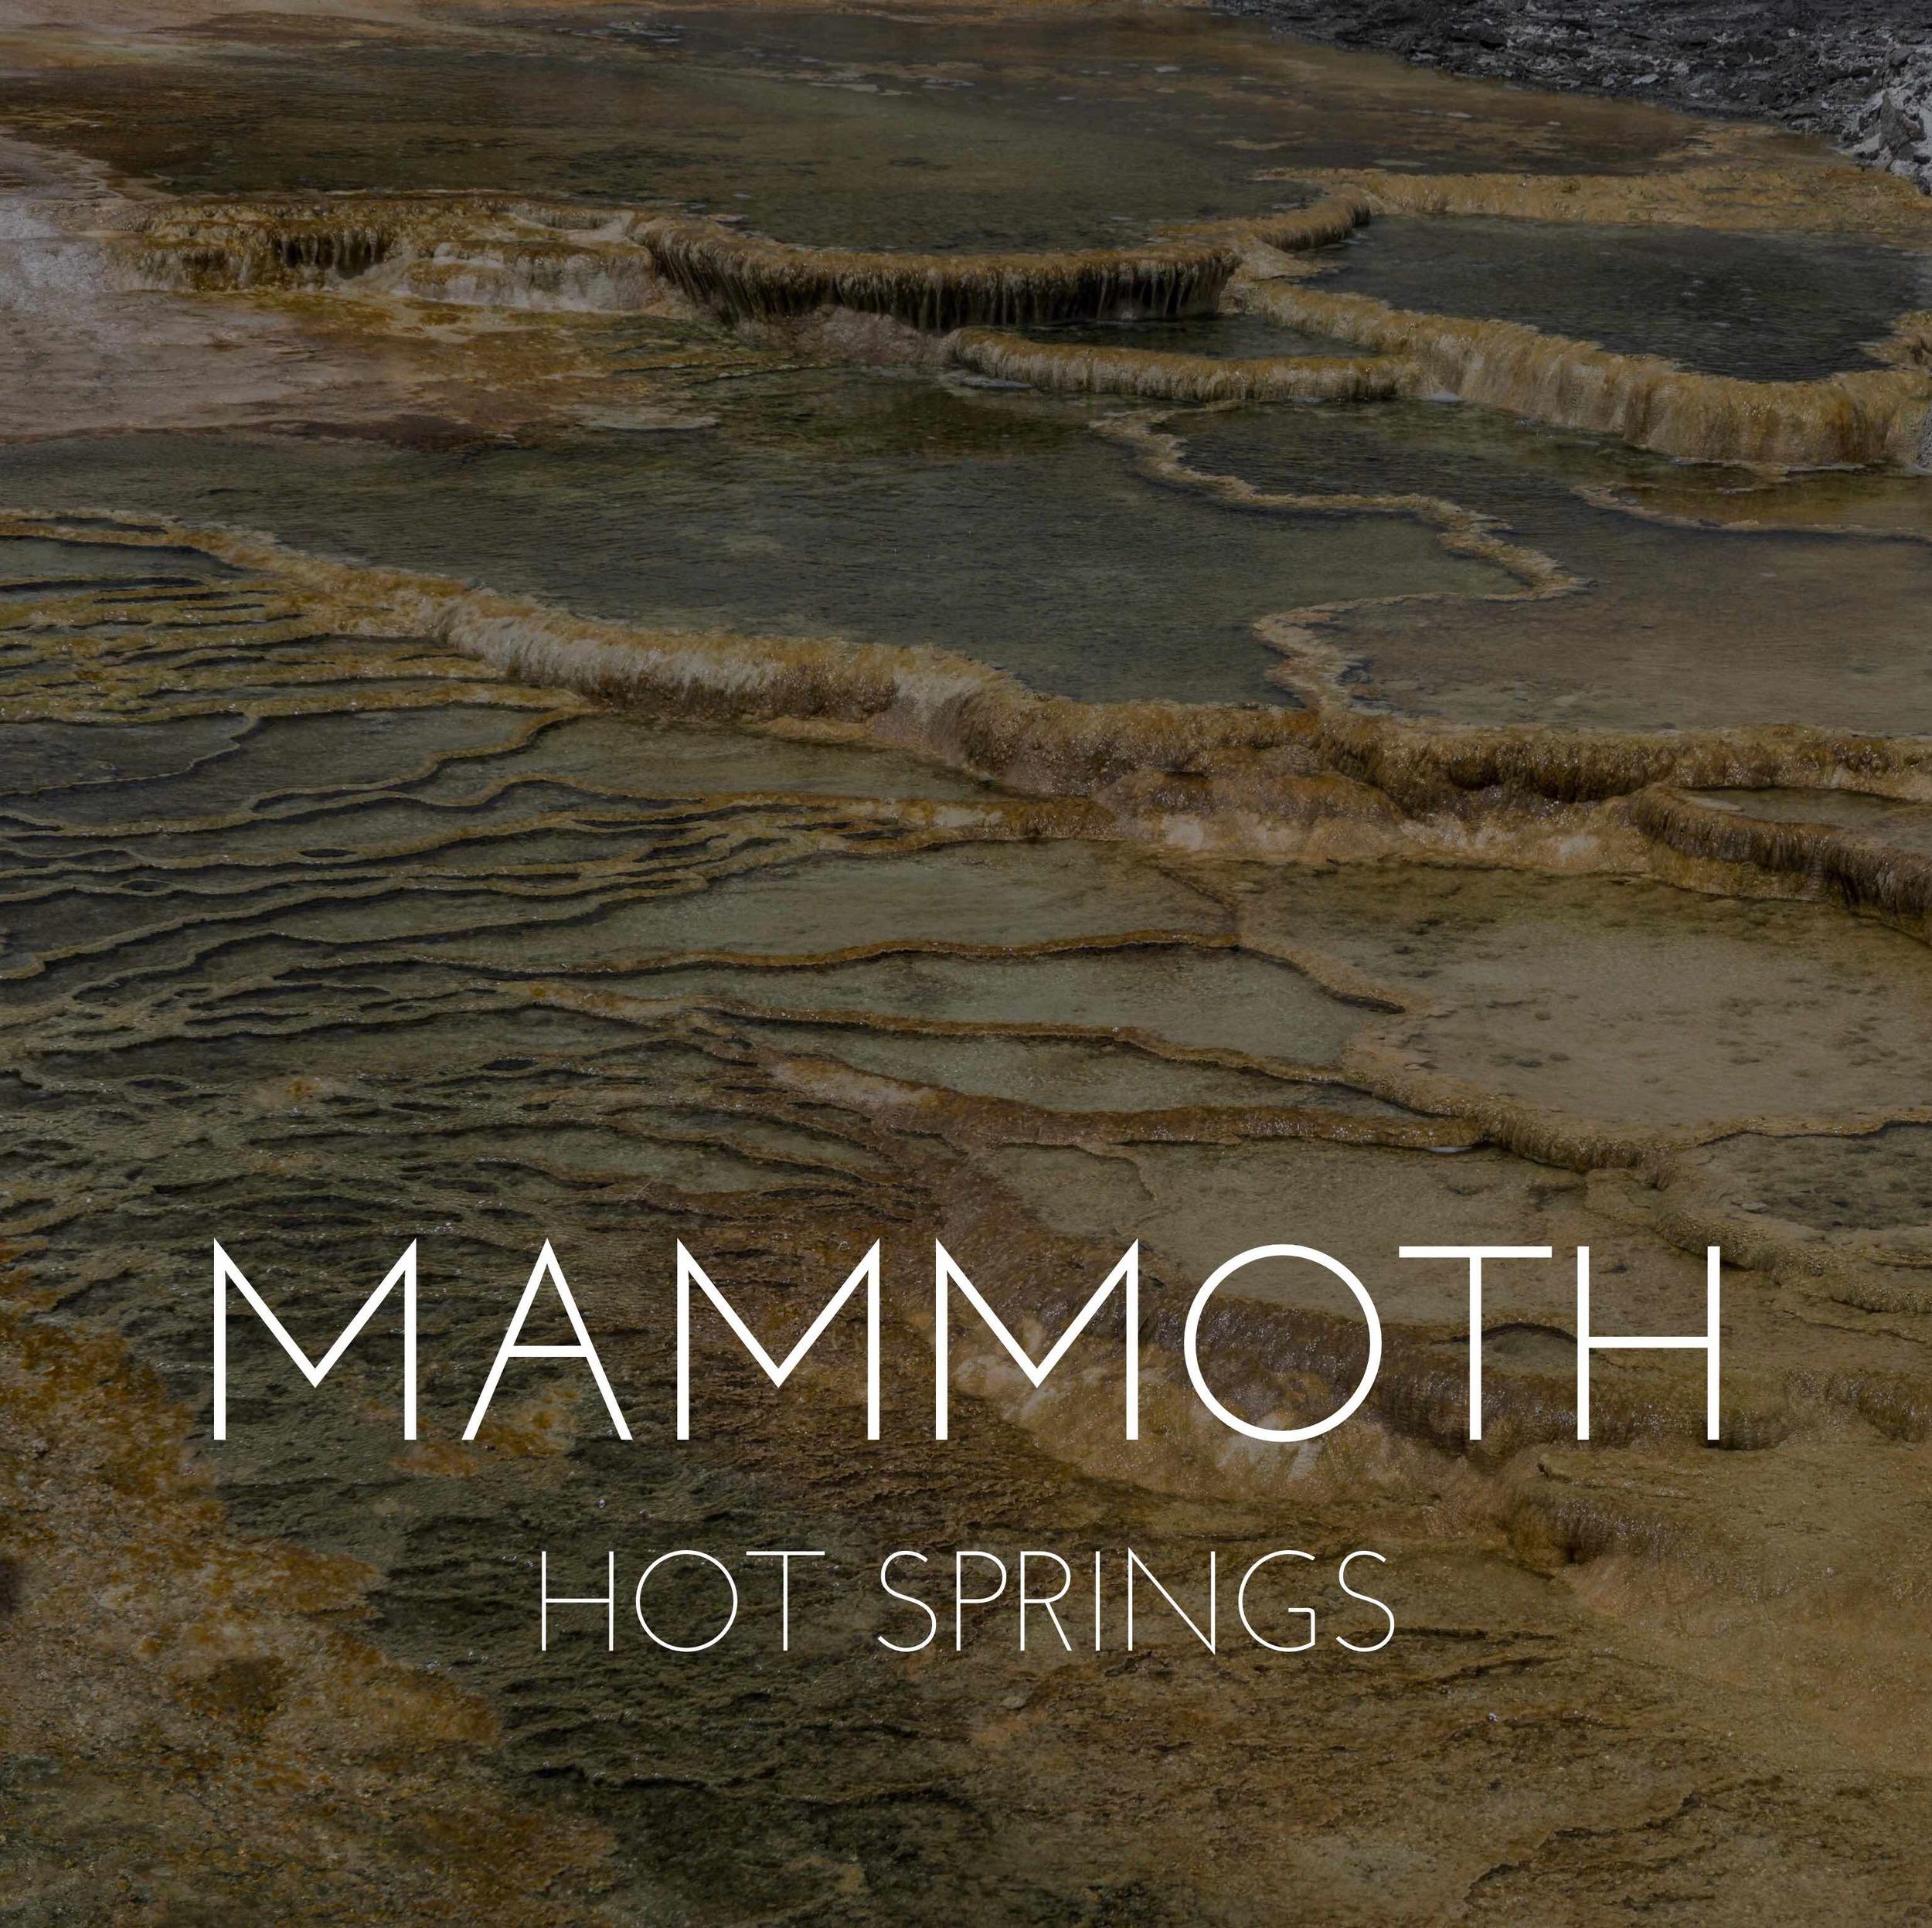 MammothHotSpringsTitle